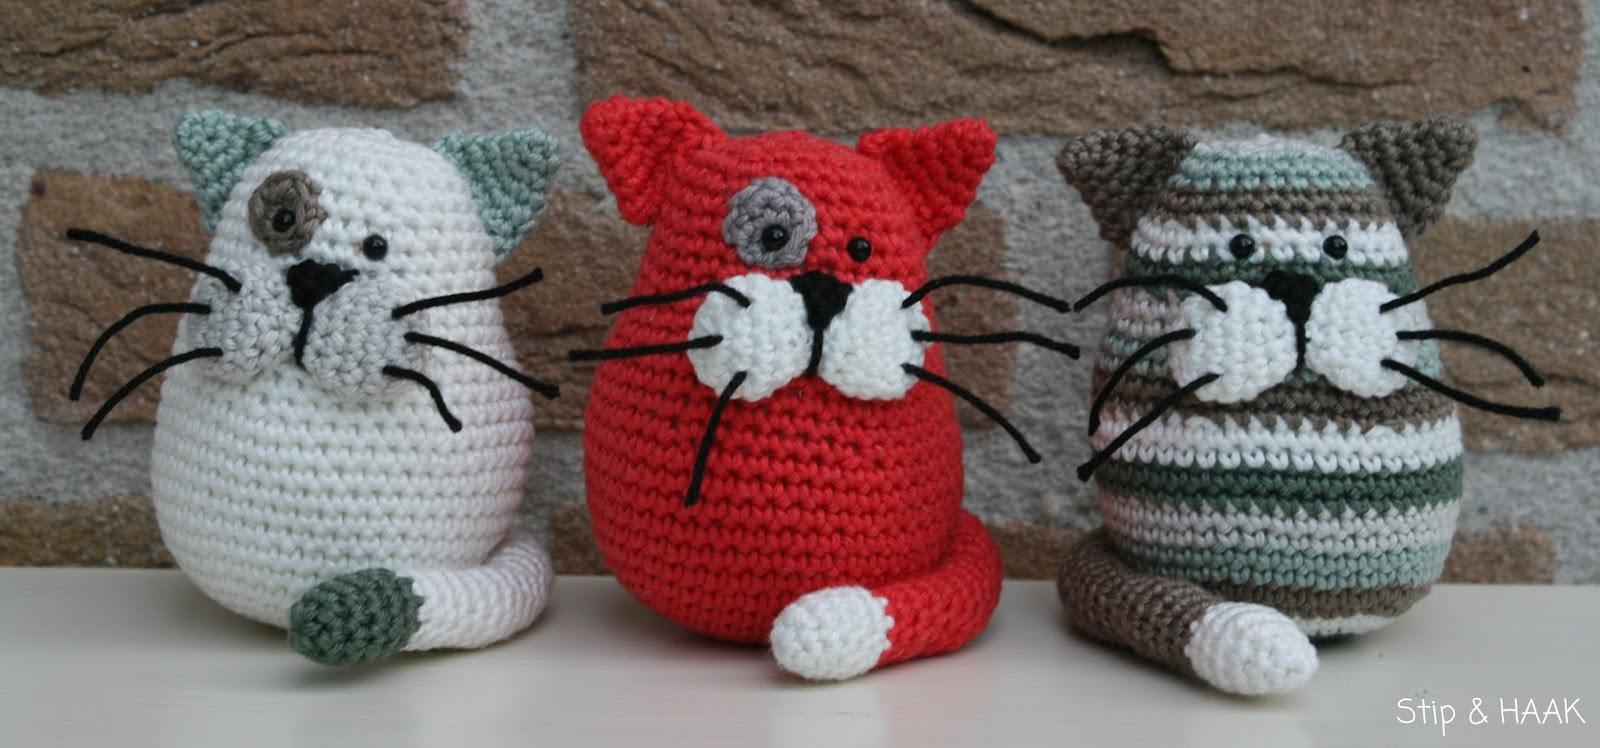 Mod le gratis amigurumi chat multicolore - Chats gratuits ...